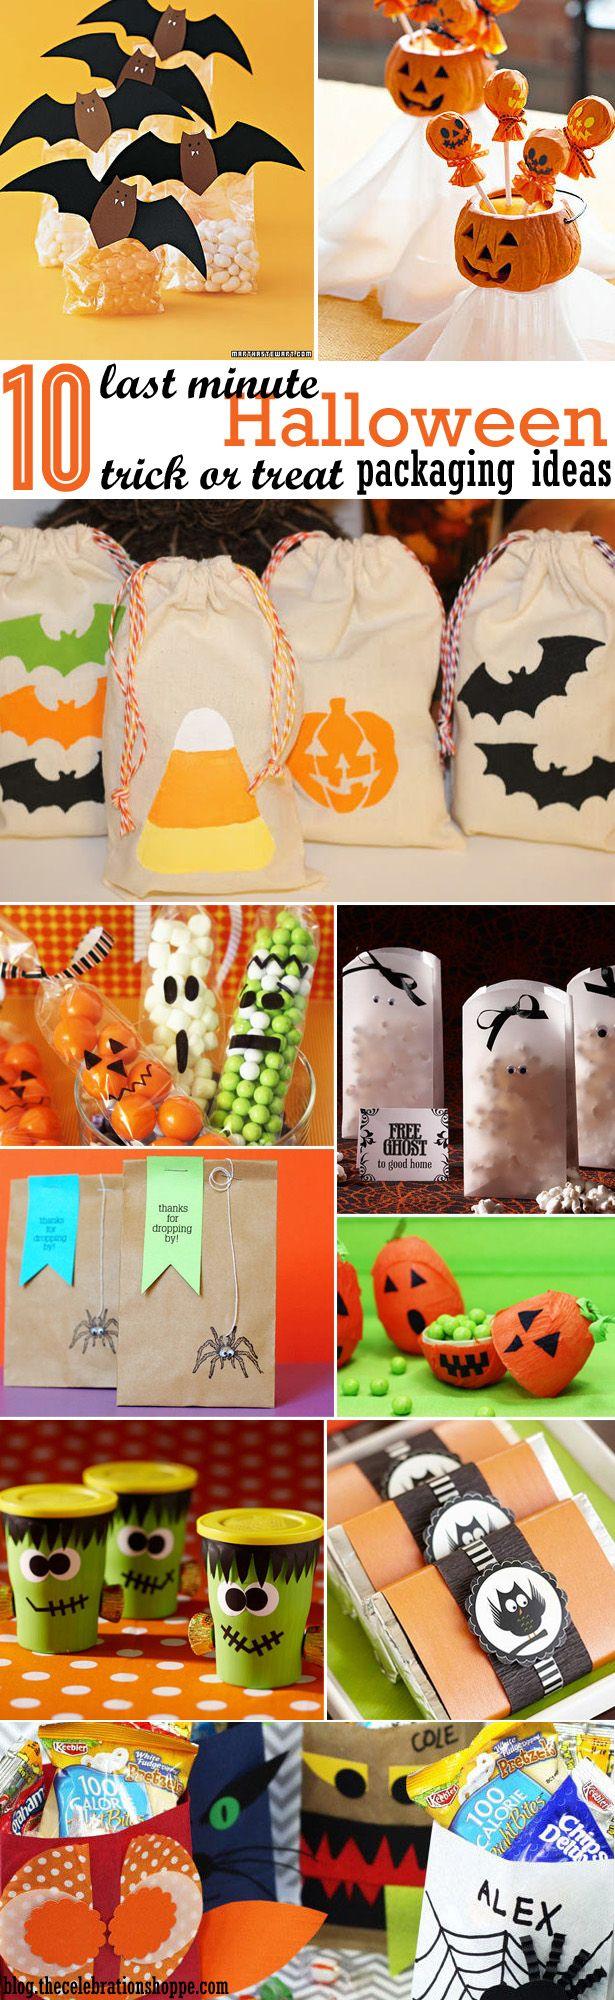 10 Last Minute Trick or Treat Packaging Ideas via blog.thecelebrationshoppe.com #Halloween #crafts